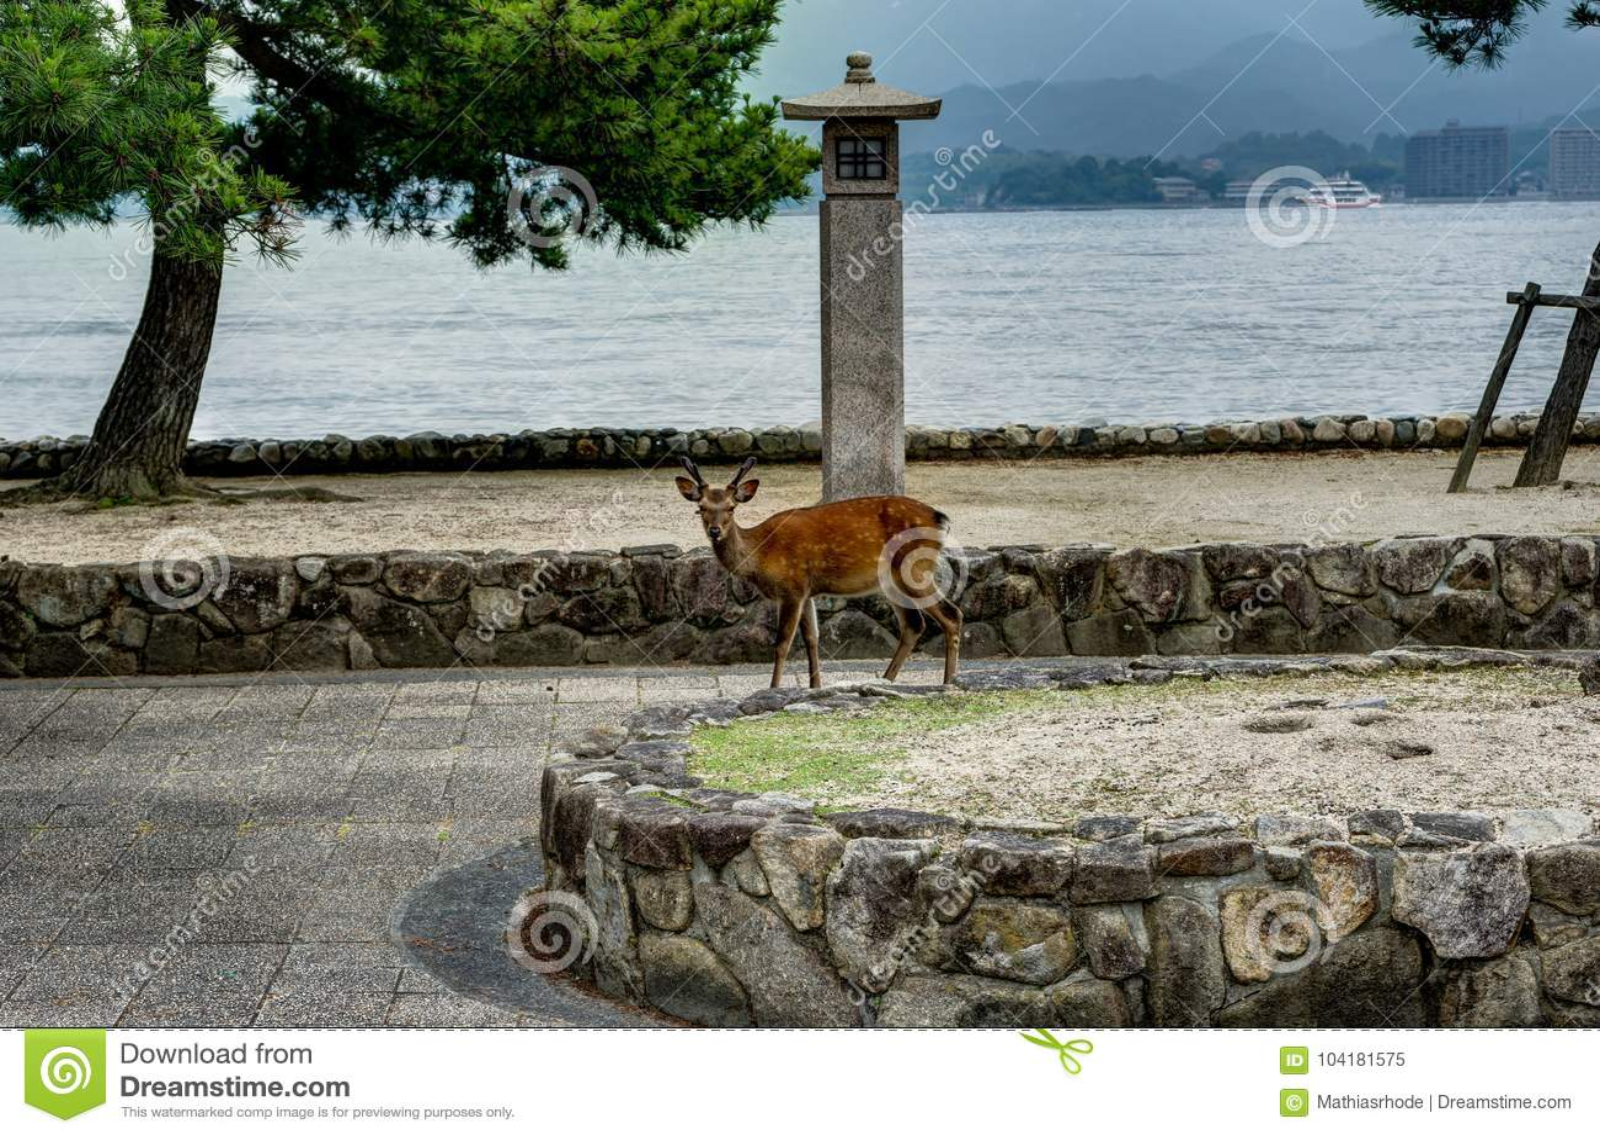 The deer of Miyajima Island in Hiroshima, Japan